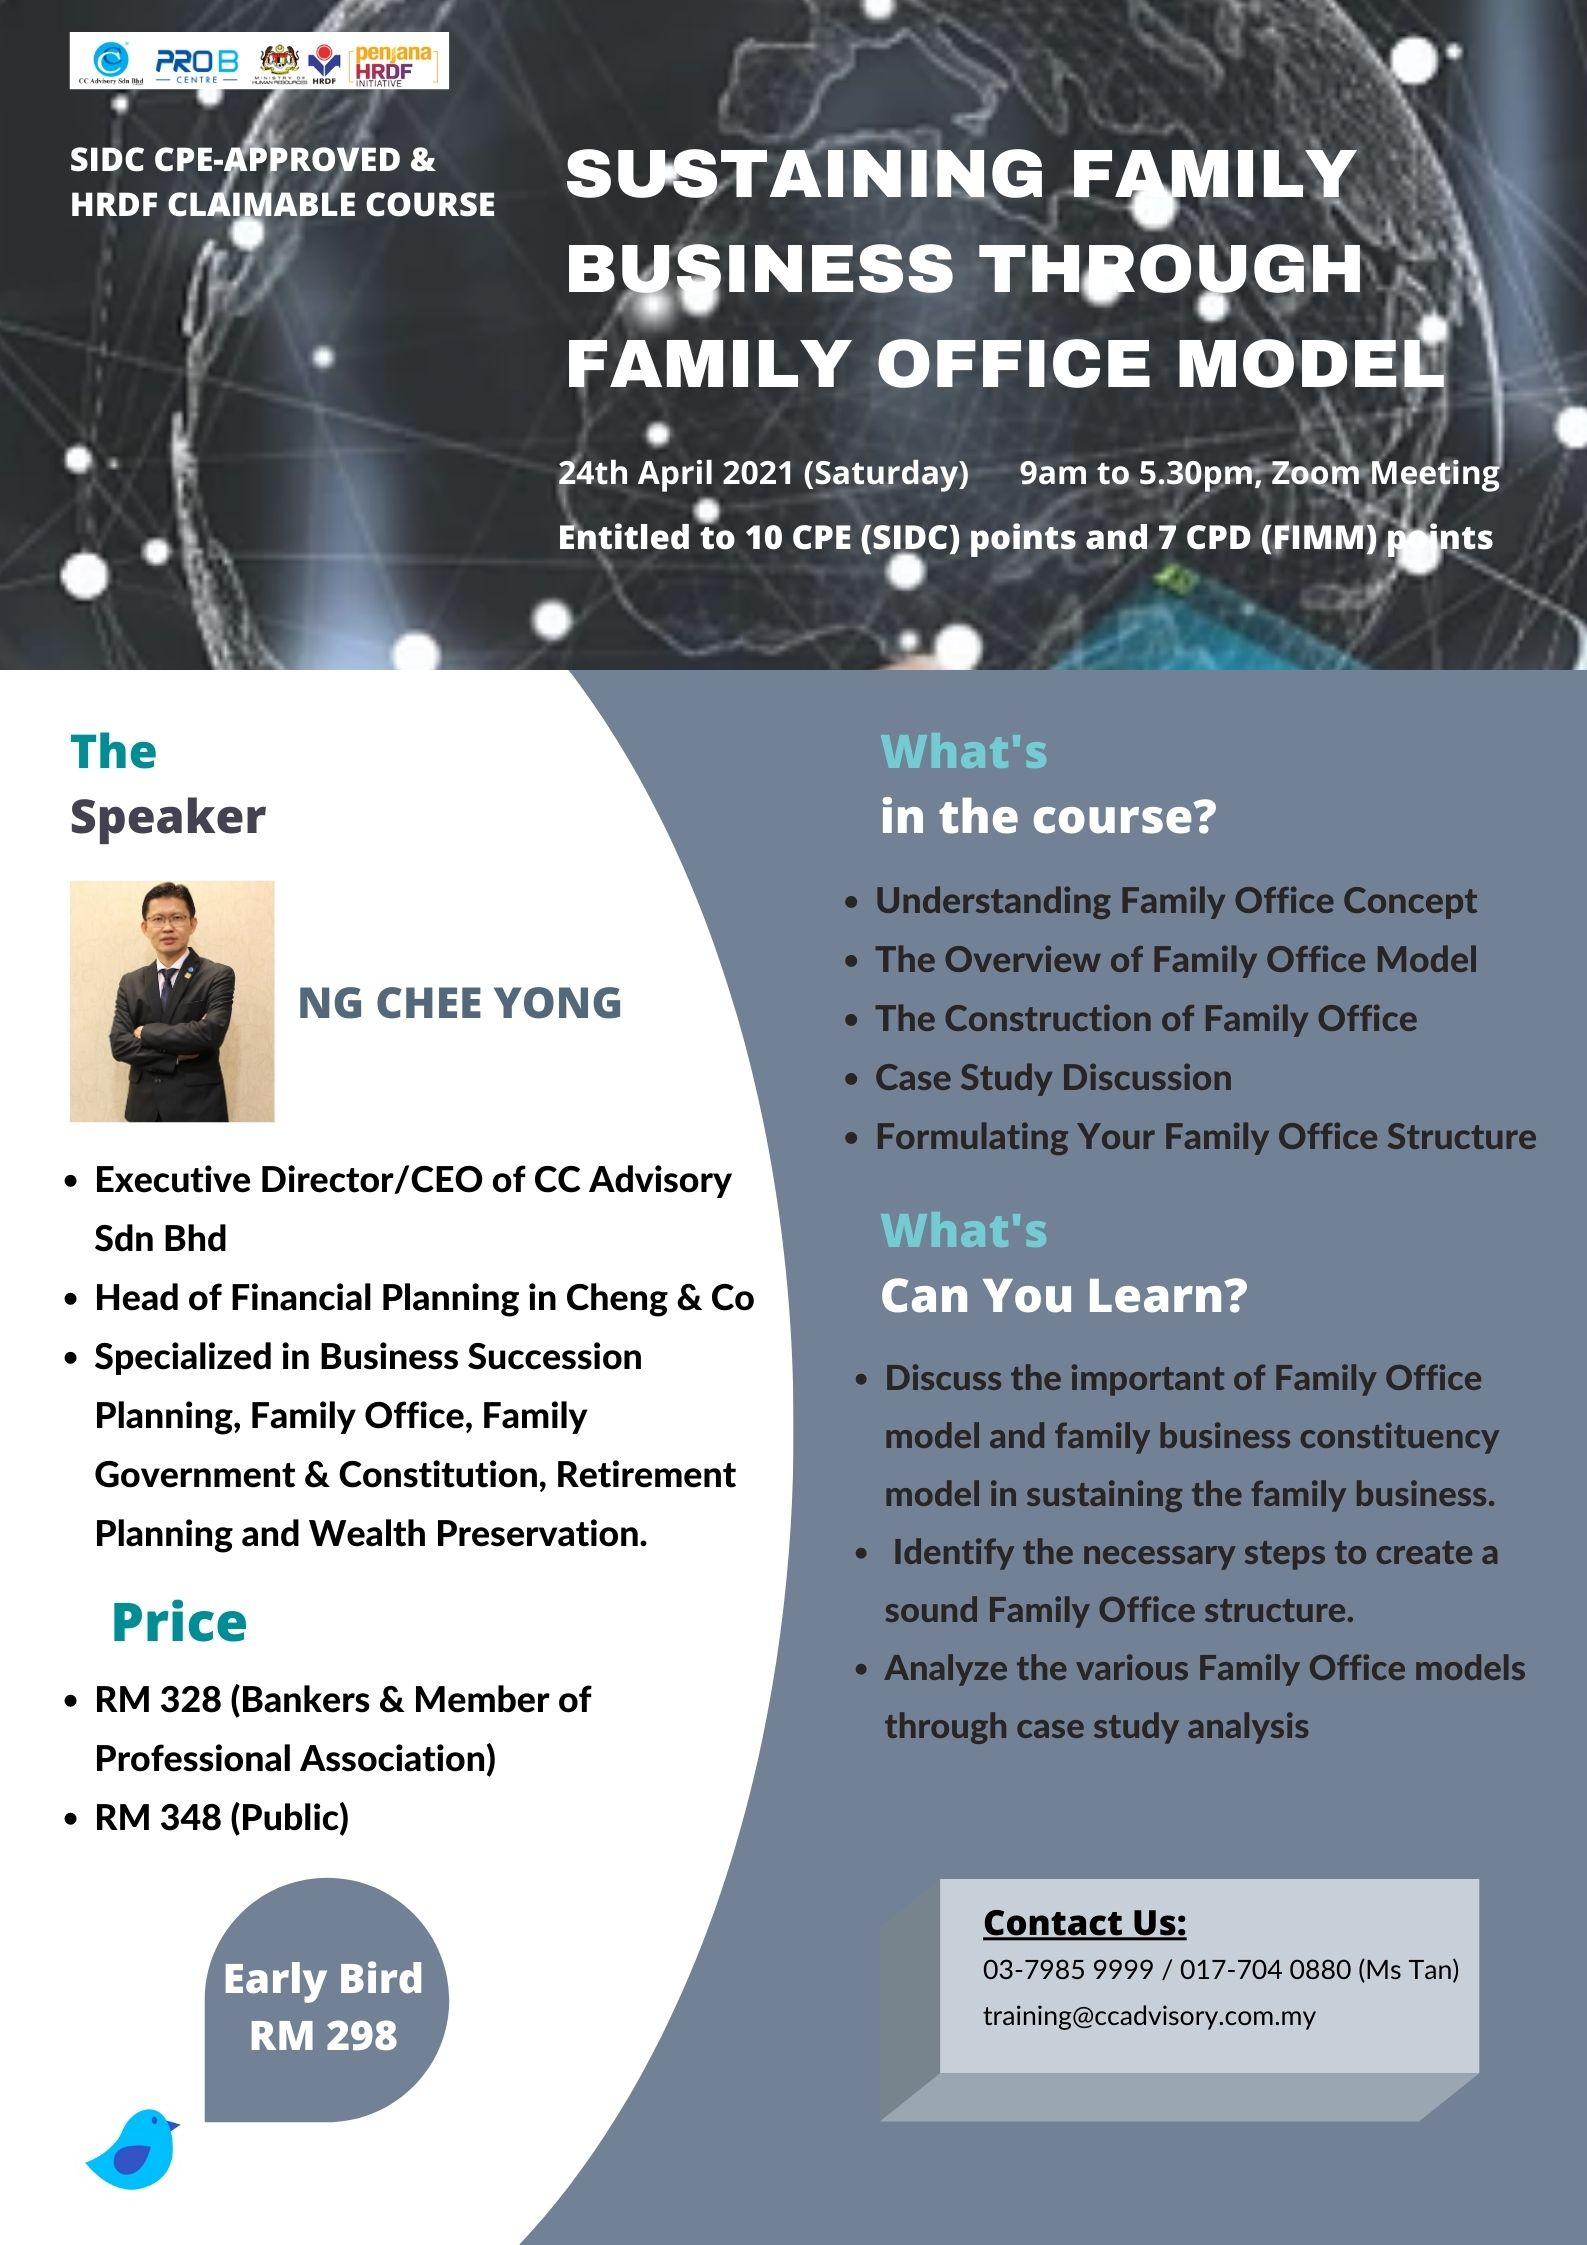 Sustaining Family Business Through Family Office Model